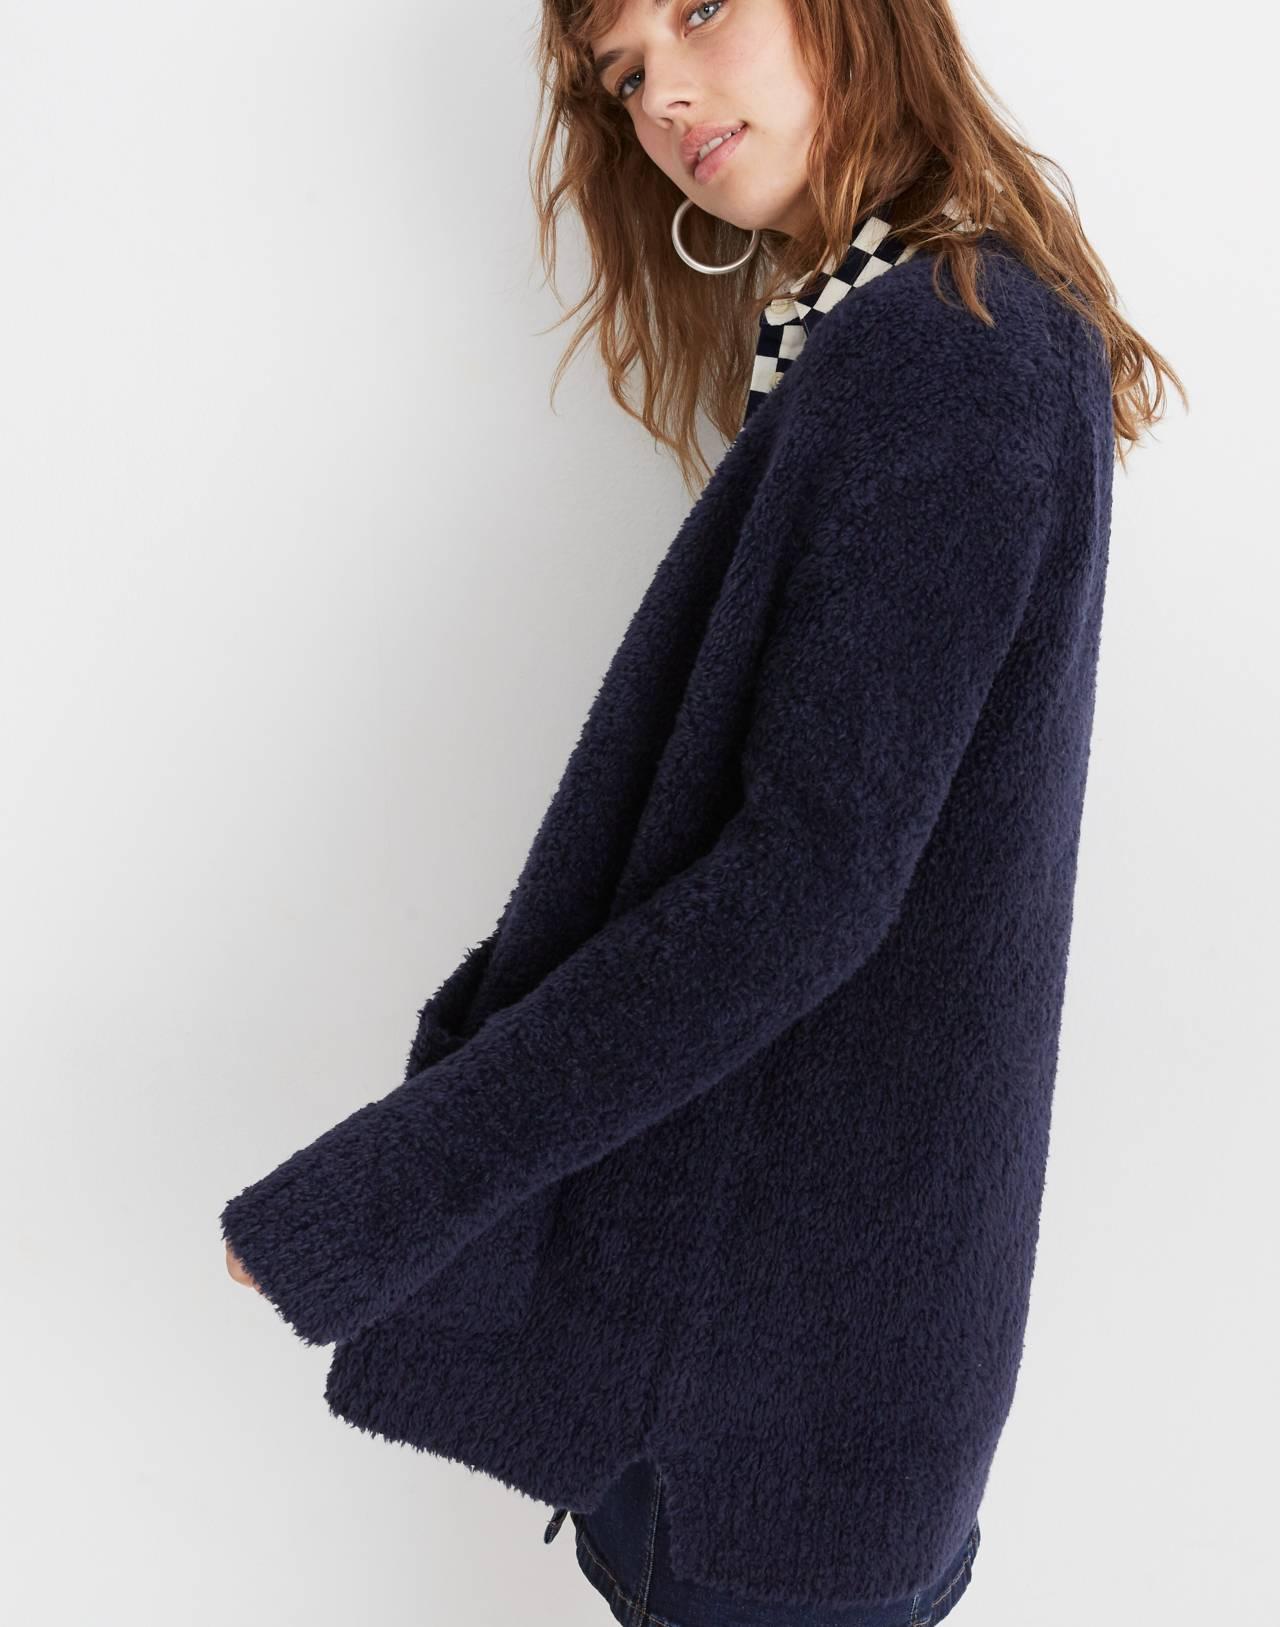 Teddy Cardigan Sweater in dark navy image 3